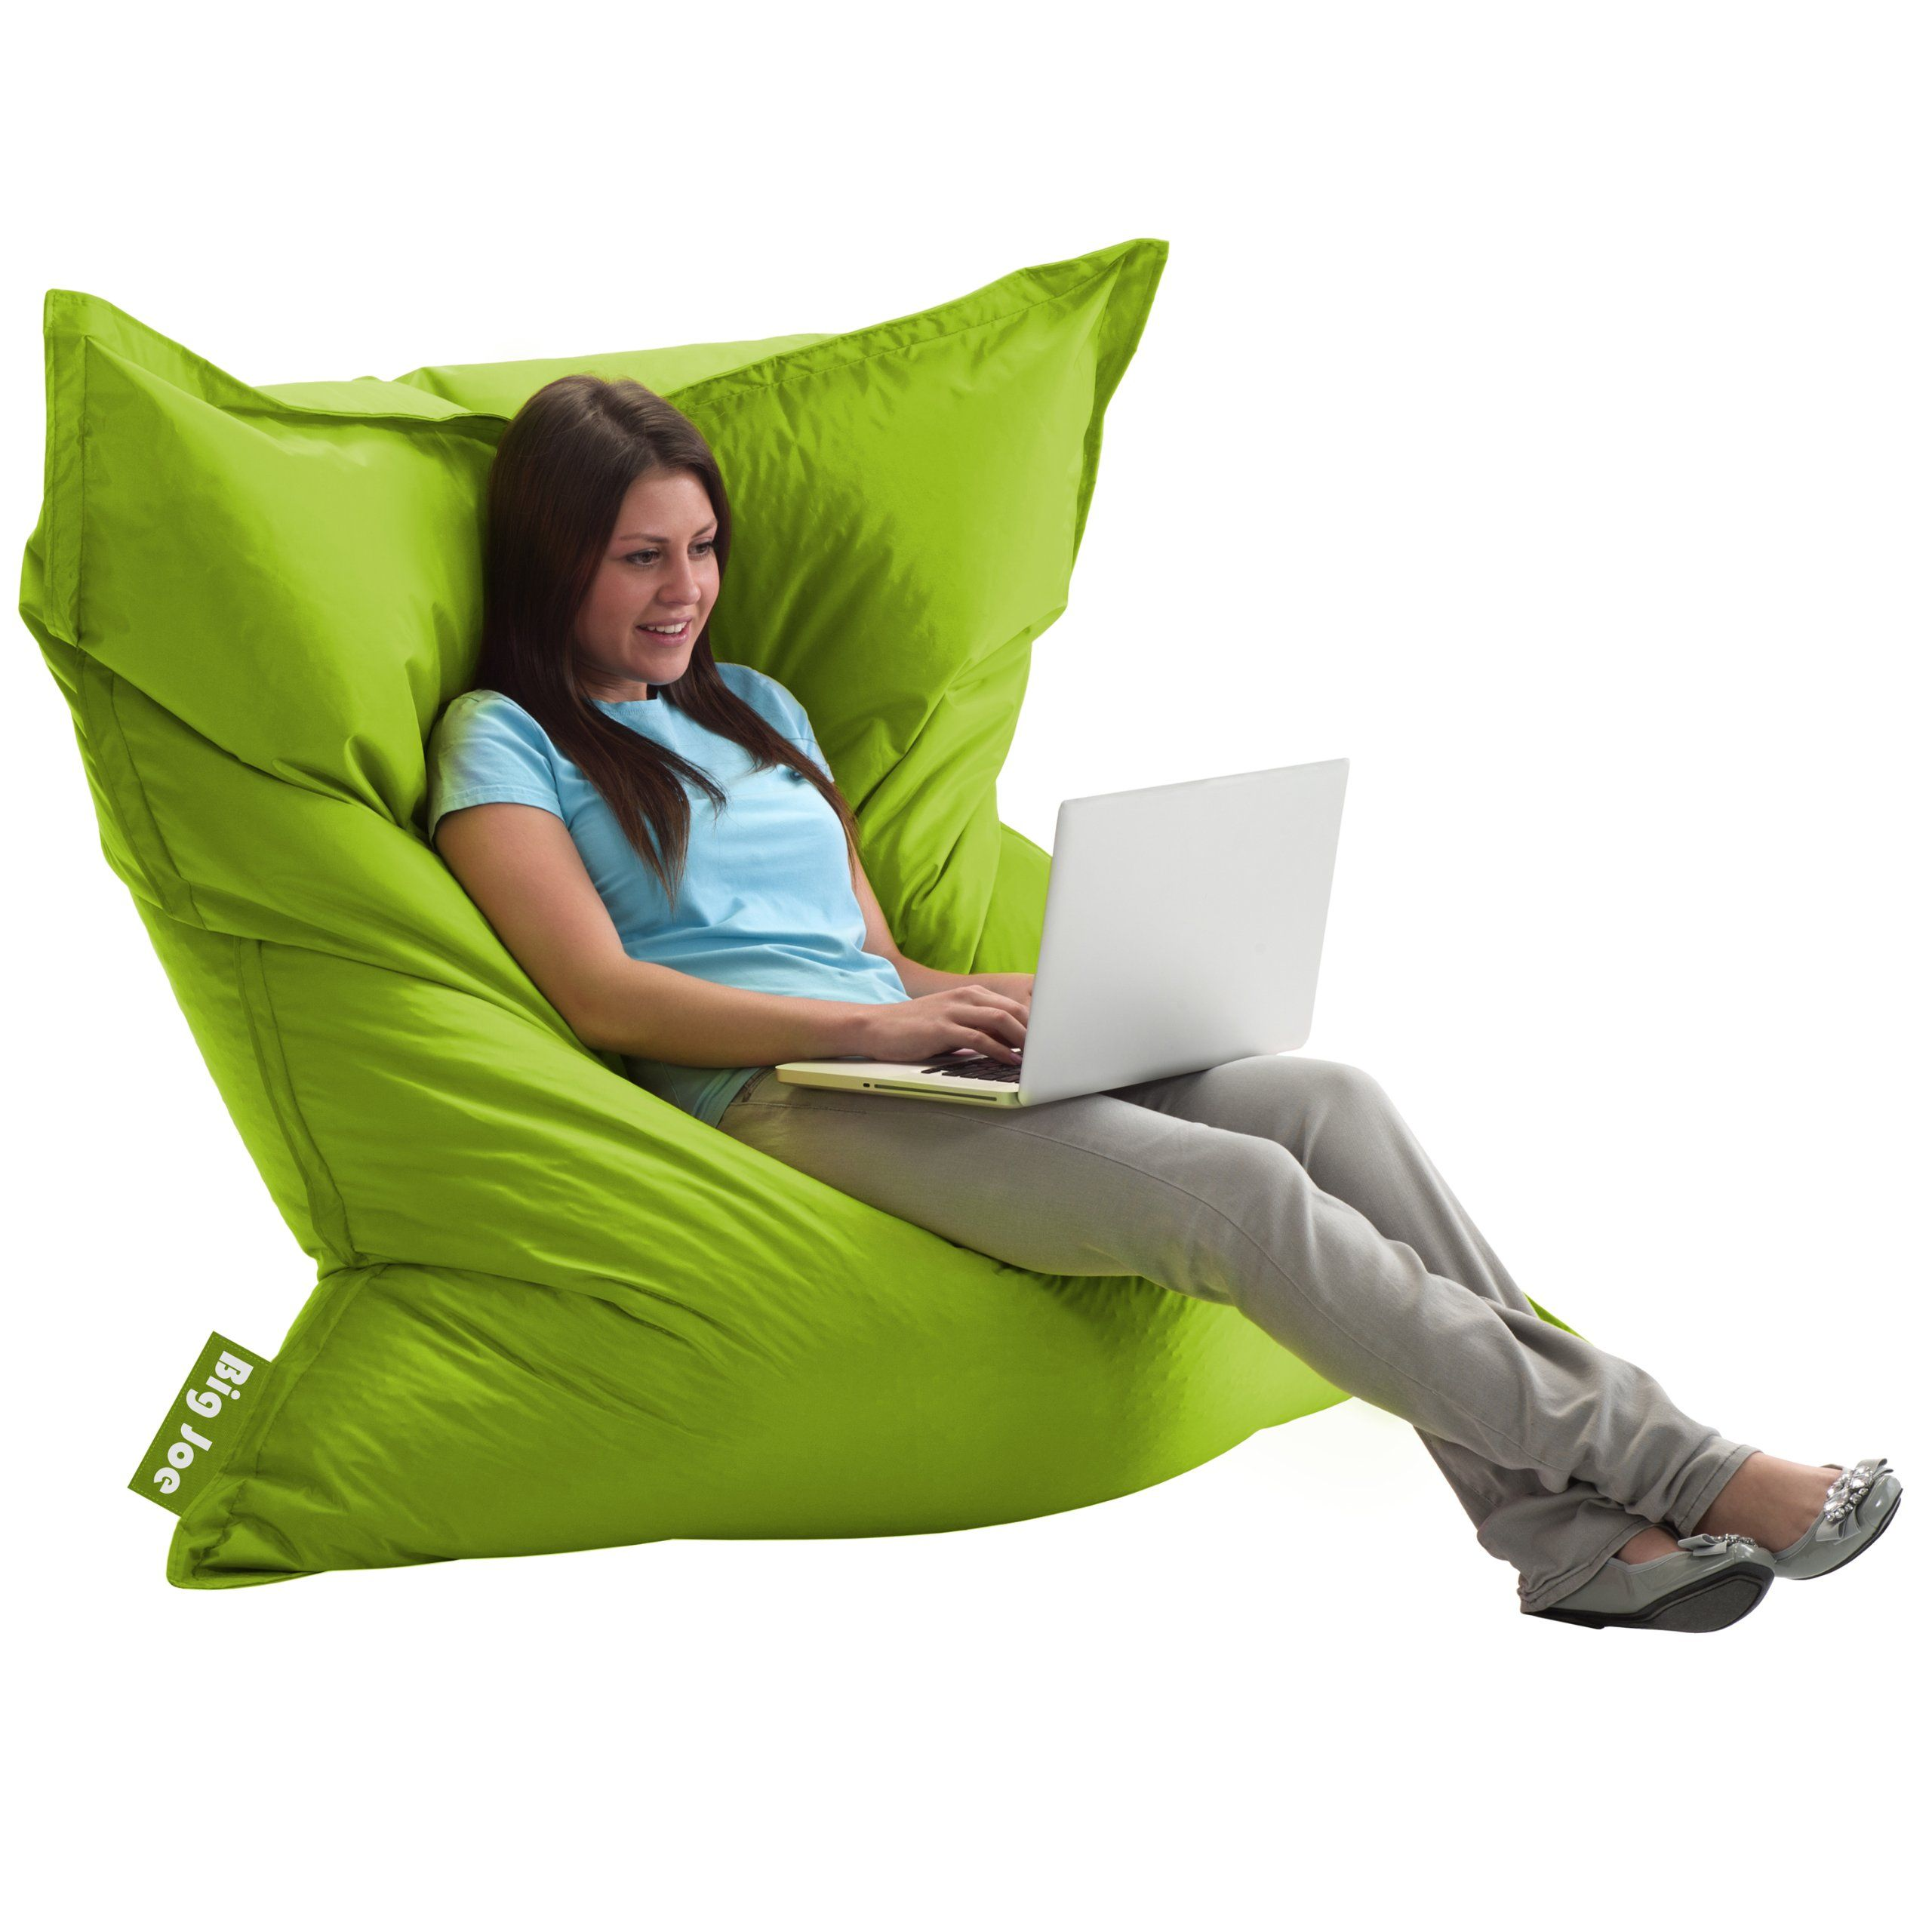 Terrific Amazon Com Big Joe Original Bean Bag Chair Flaming Red Cjindustries Chair Design For Home Cjindustriesco